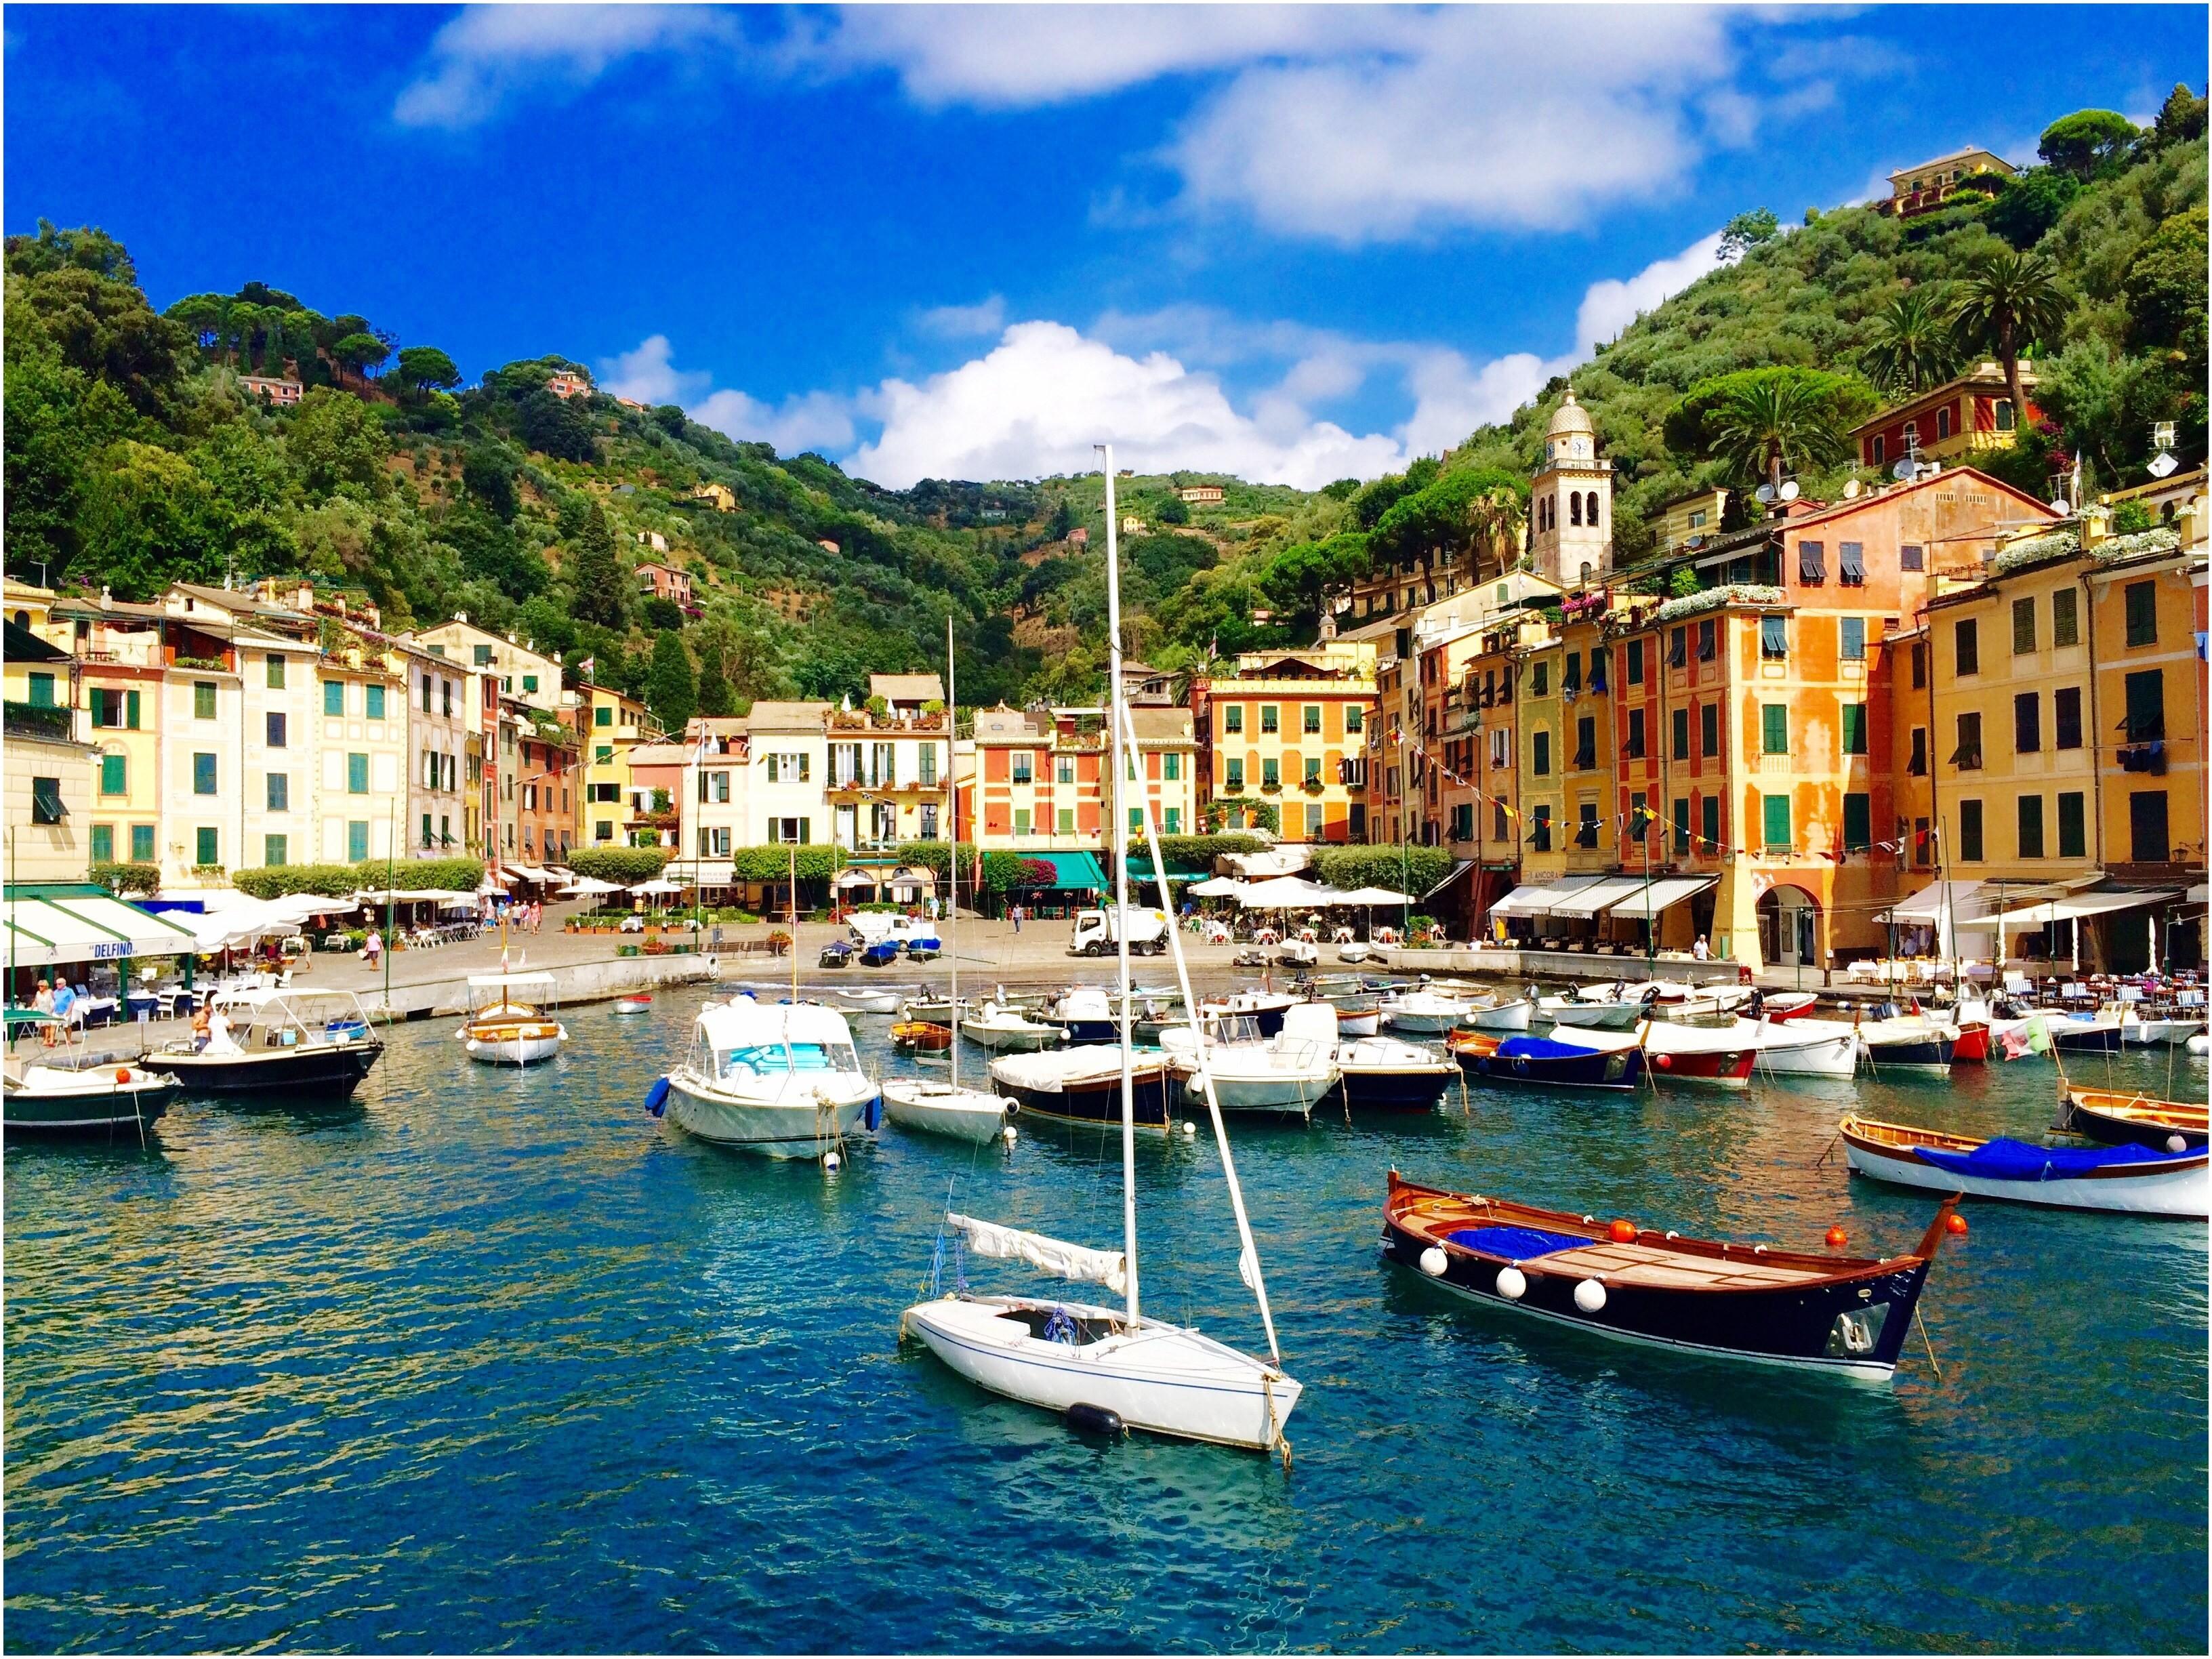 The Perfect Itinerary for an Idyllic Honeymoon in Portofino Italy